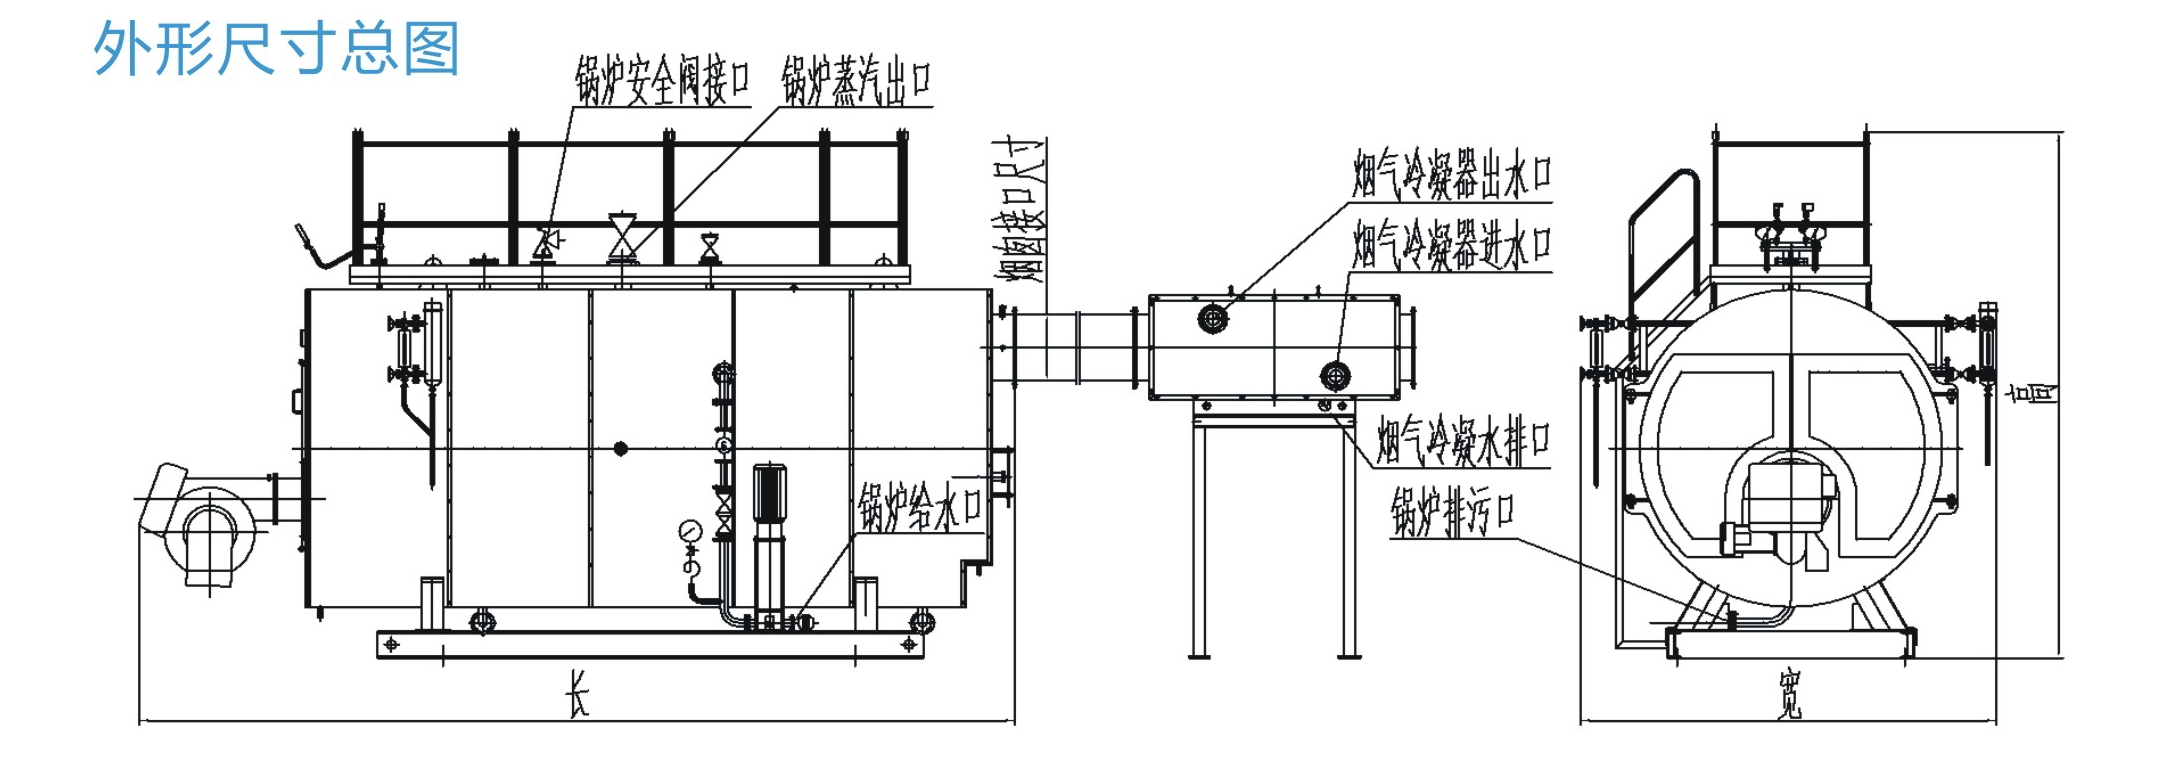 WNS分体式燃油(气)冷凝蒸汽锅炉2-1_看图王.jpg